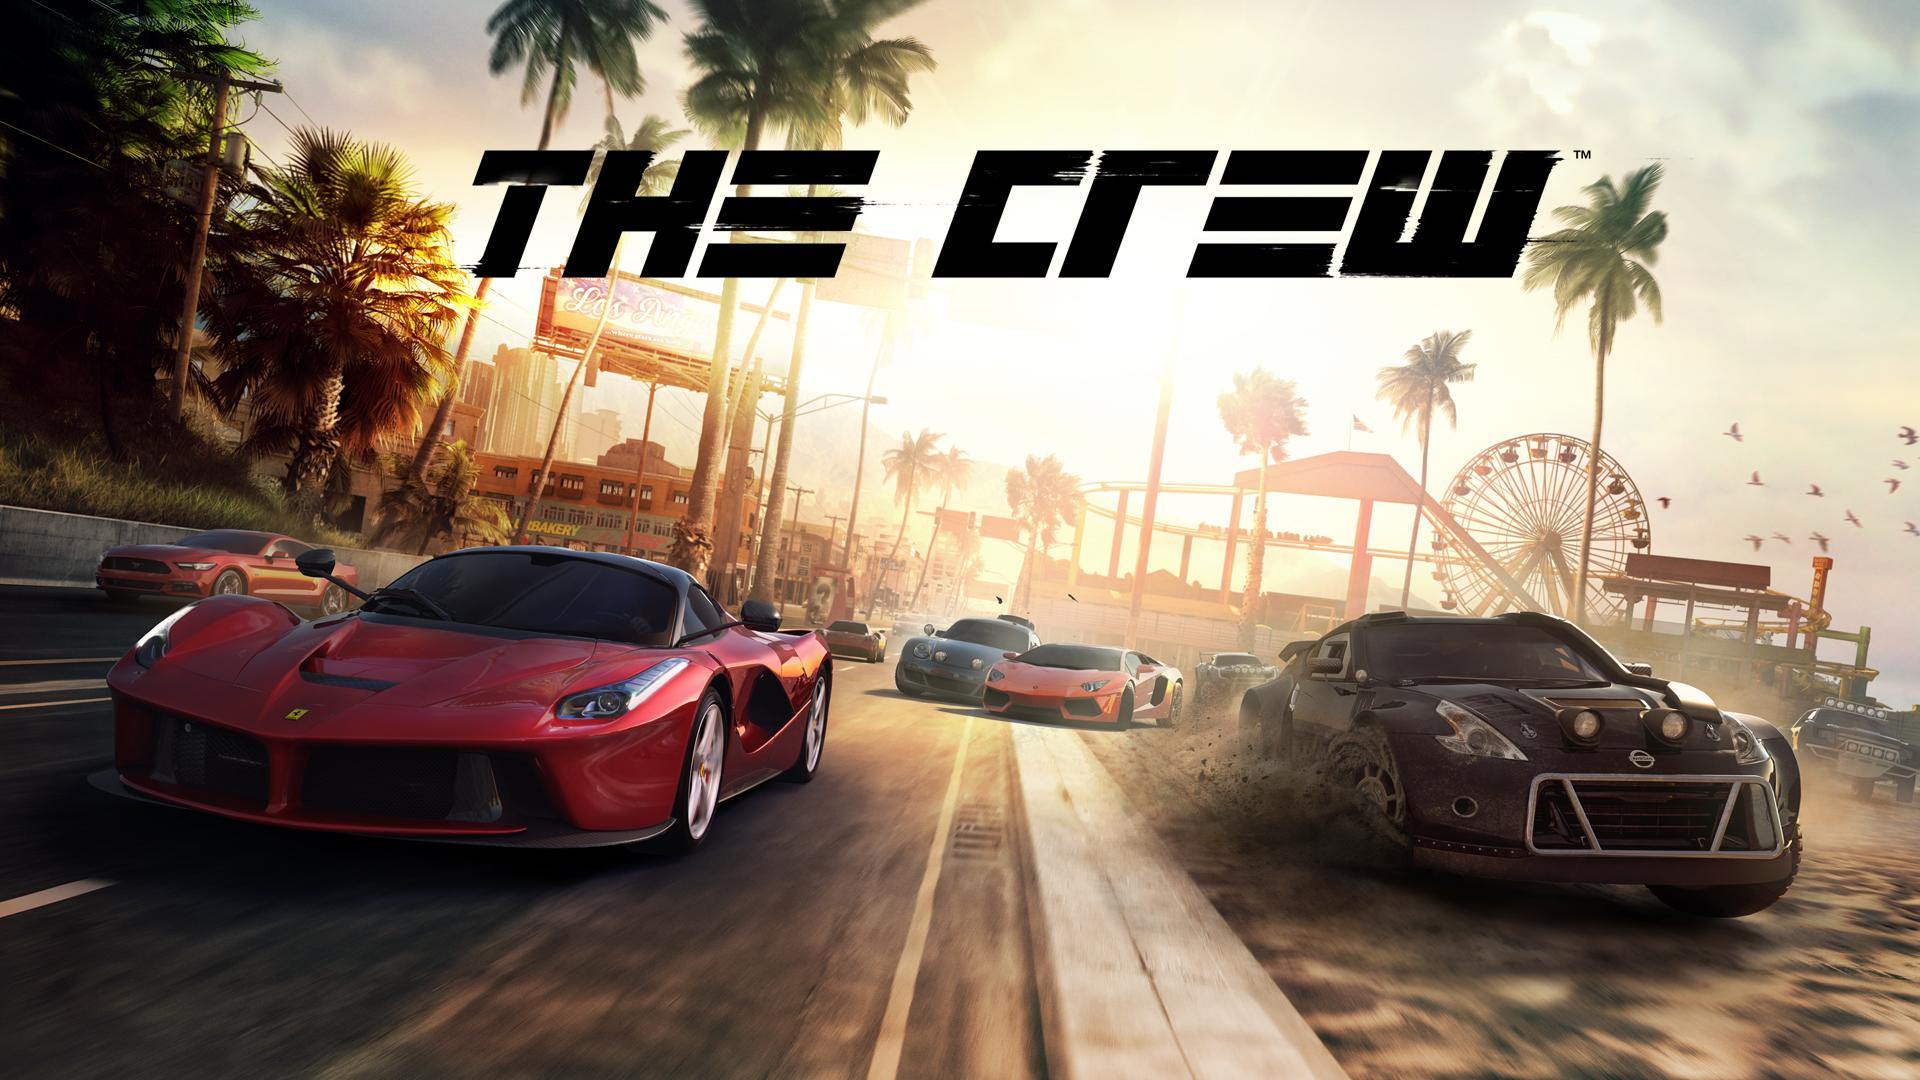 Ubisoft revela que The Crew es su próximo juego gratuito